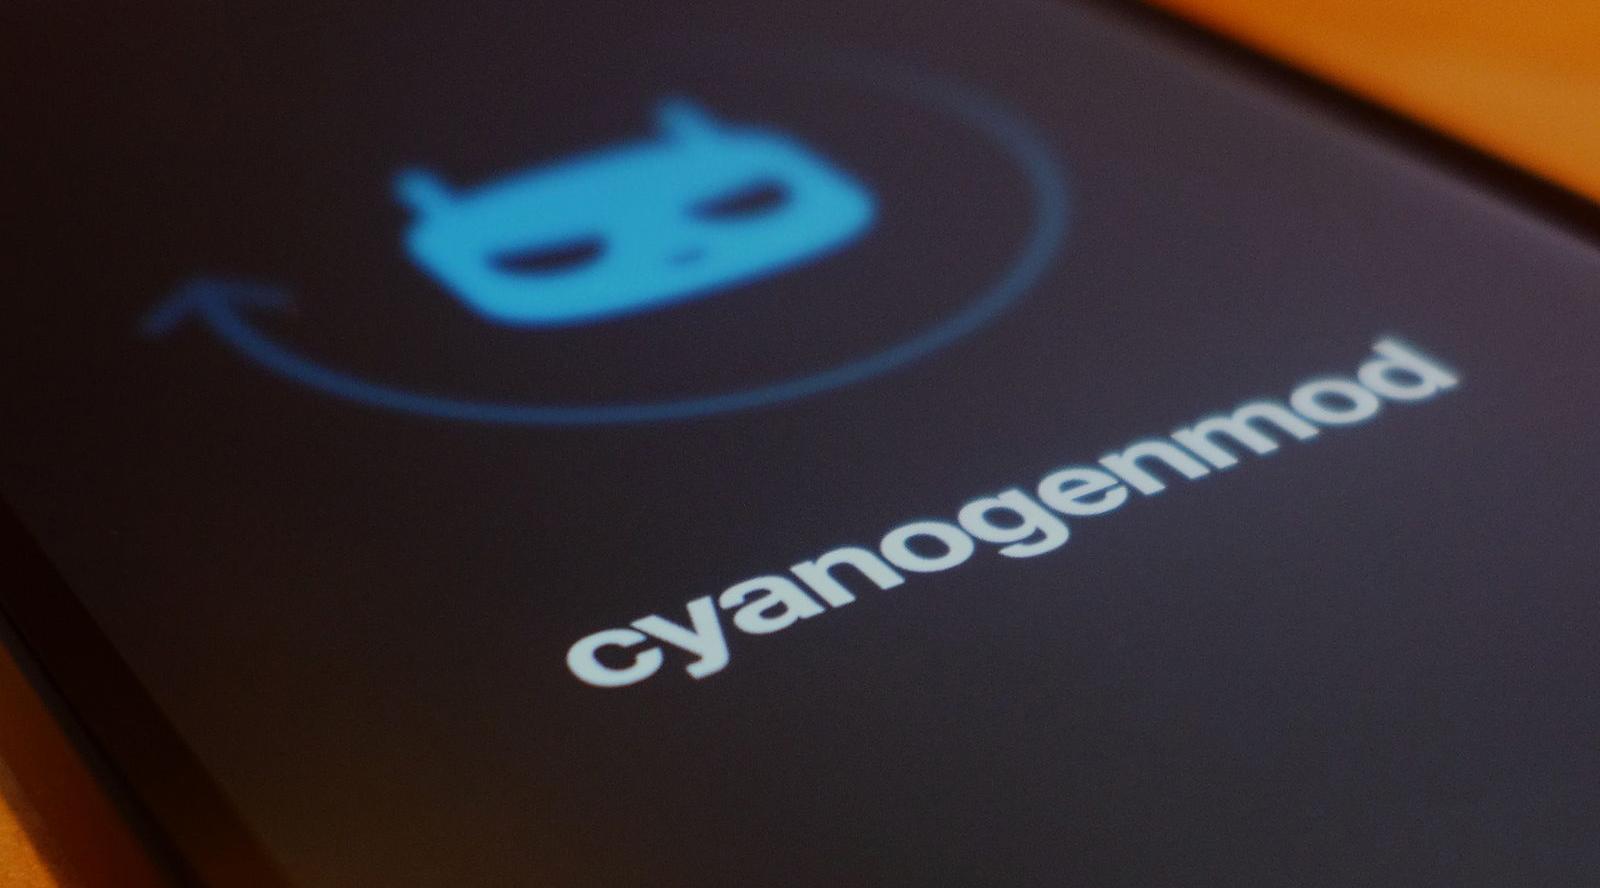 Au revoir Cyanogen OS, bonjour Cyanogen Modular OS